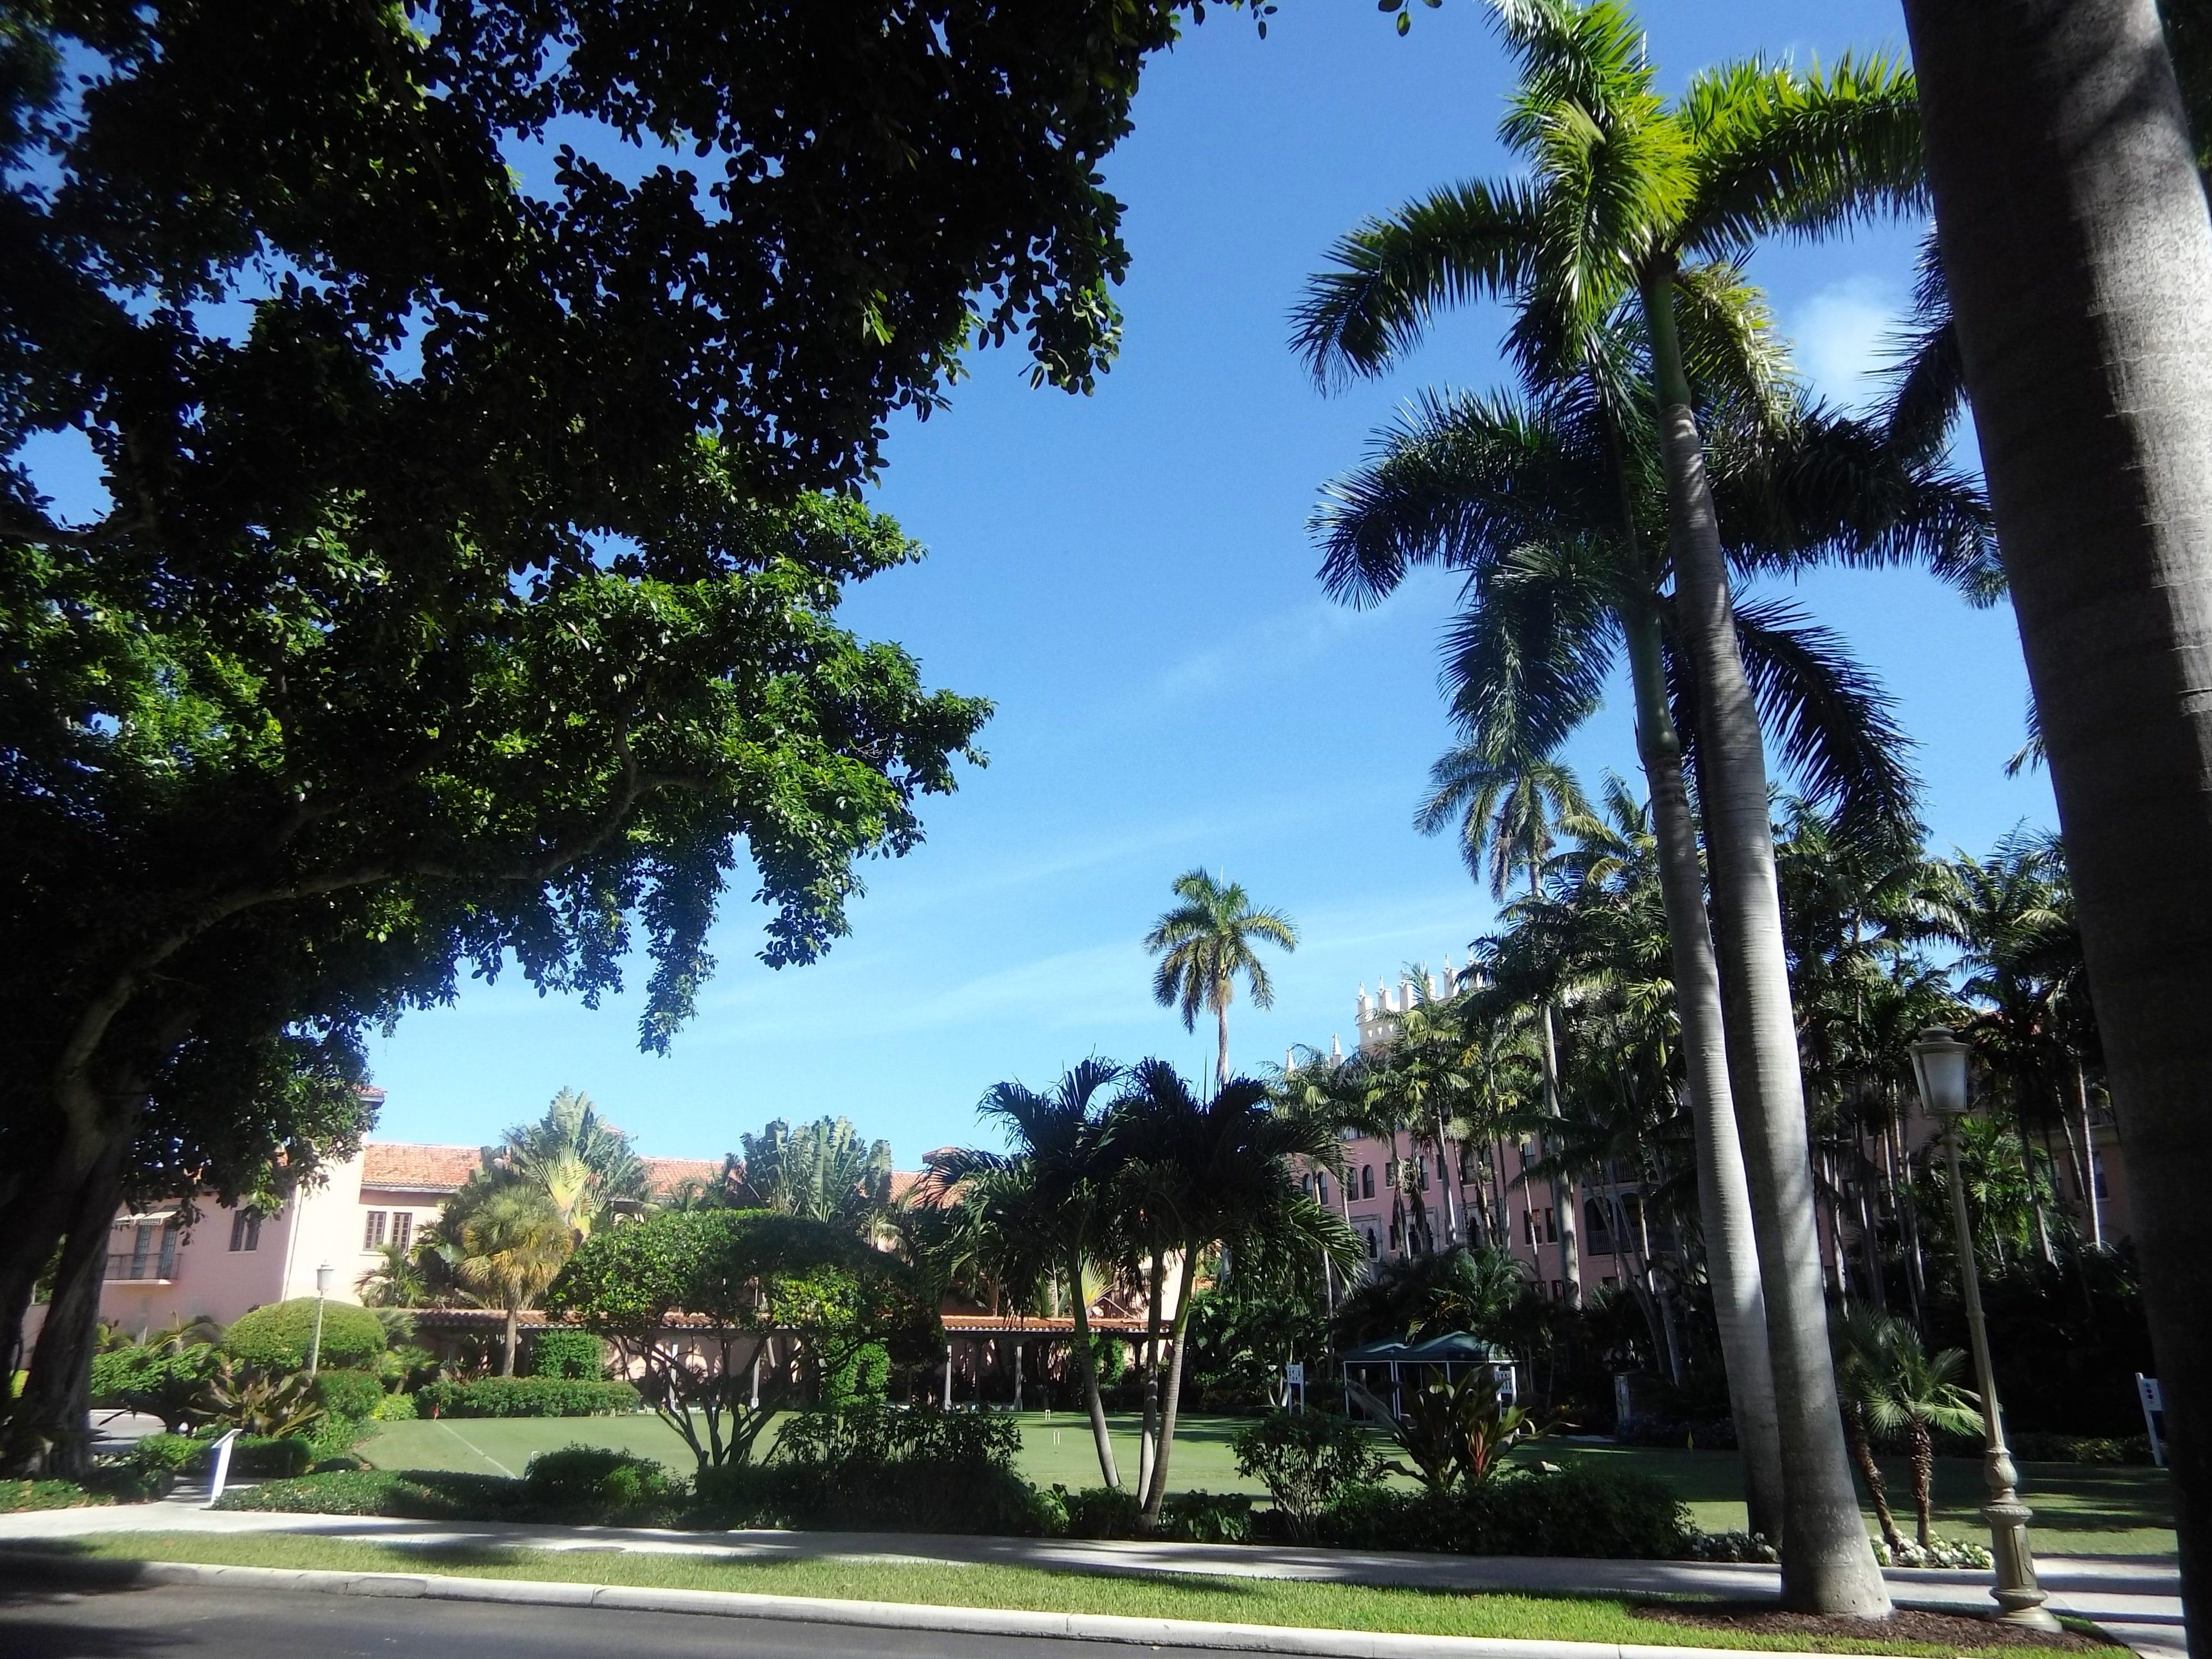 Lush foliage at Boca Raton Resort & Club.